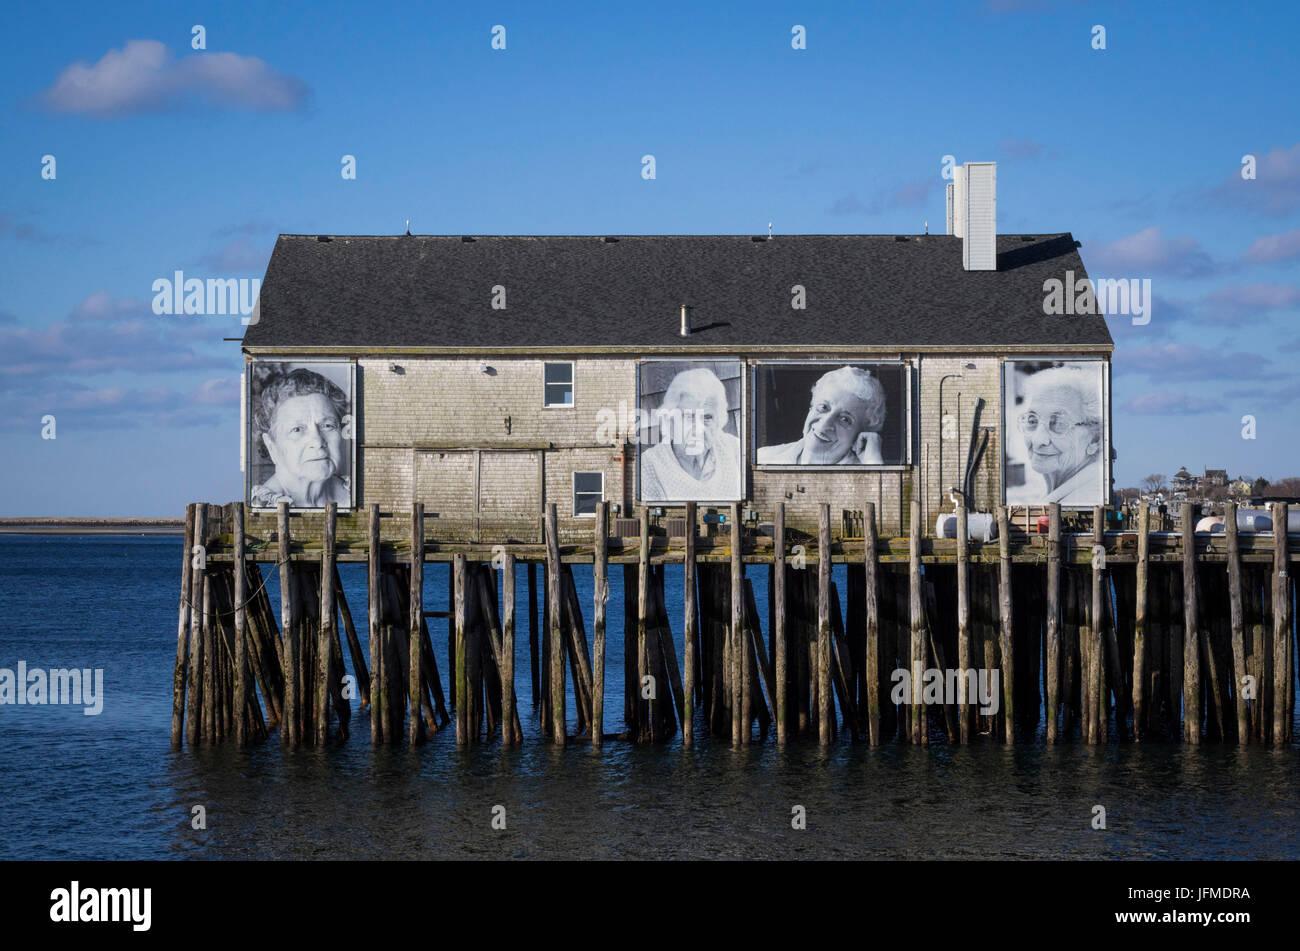 USA, Massachusetts, Cape Cod, Provincetown, Provincetown Pier, Fotos der Fischerfrauen Stockbild